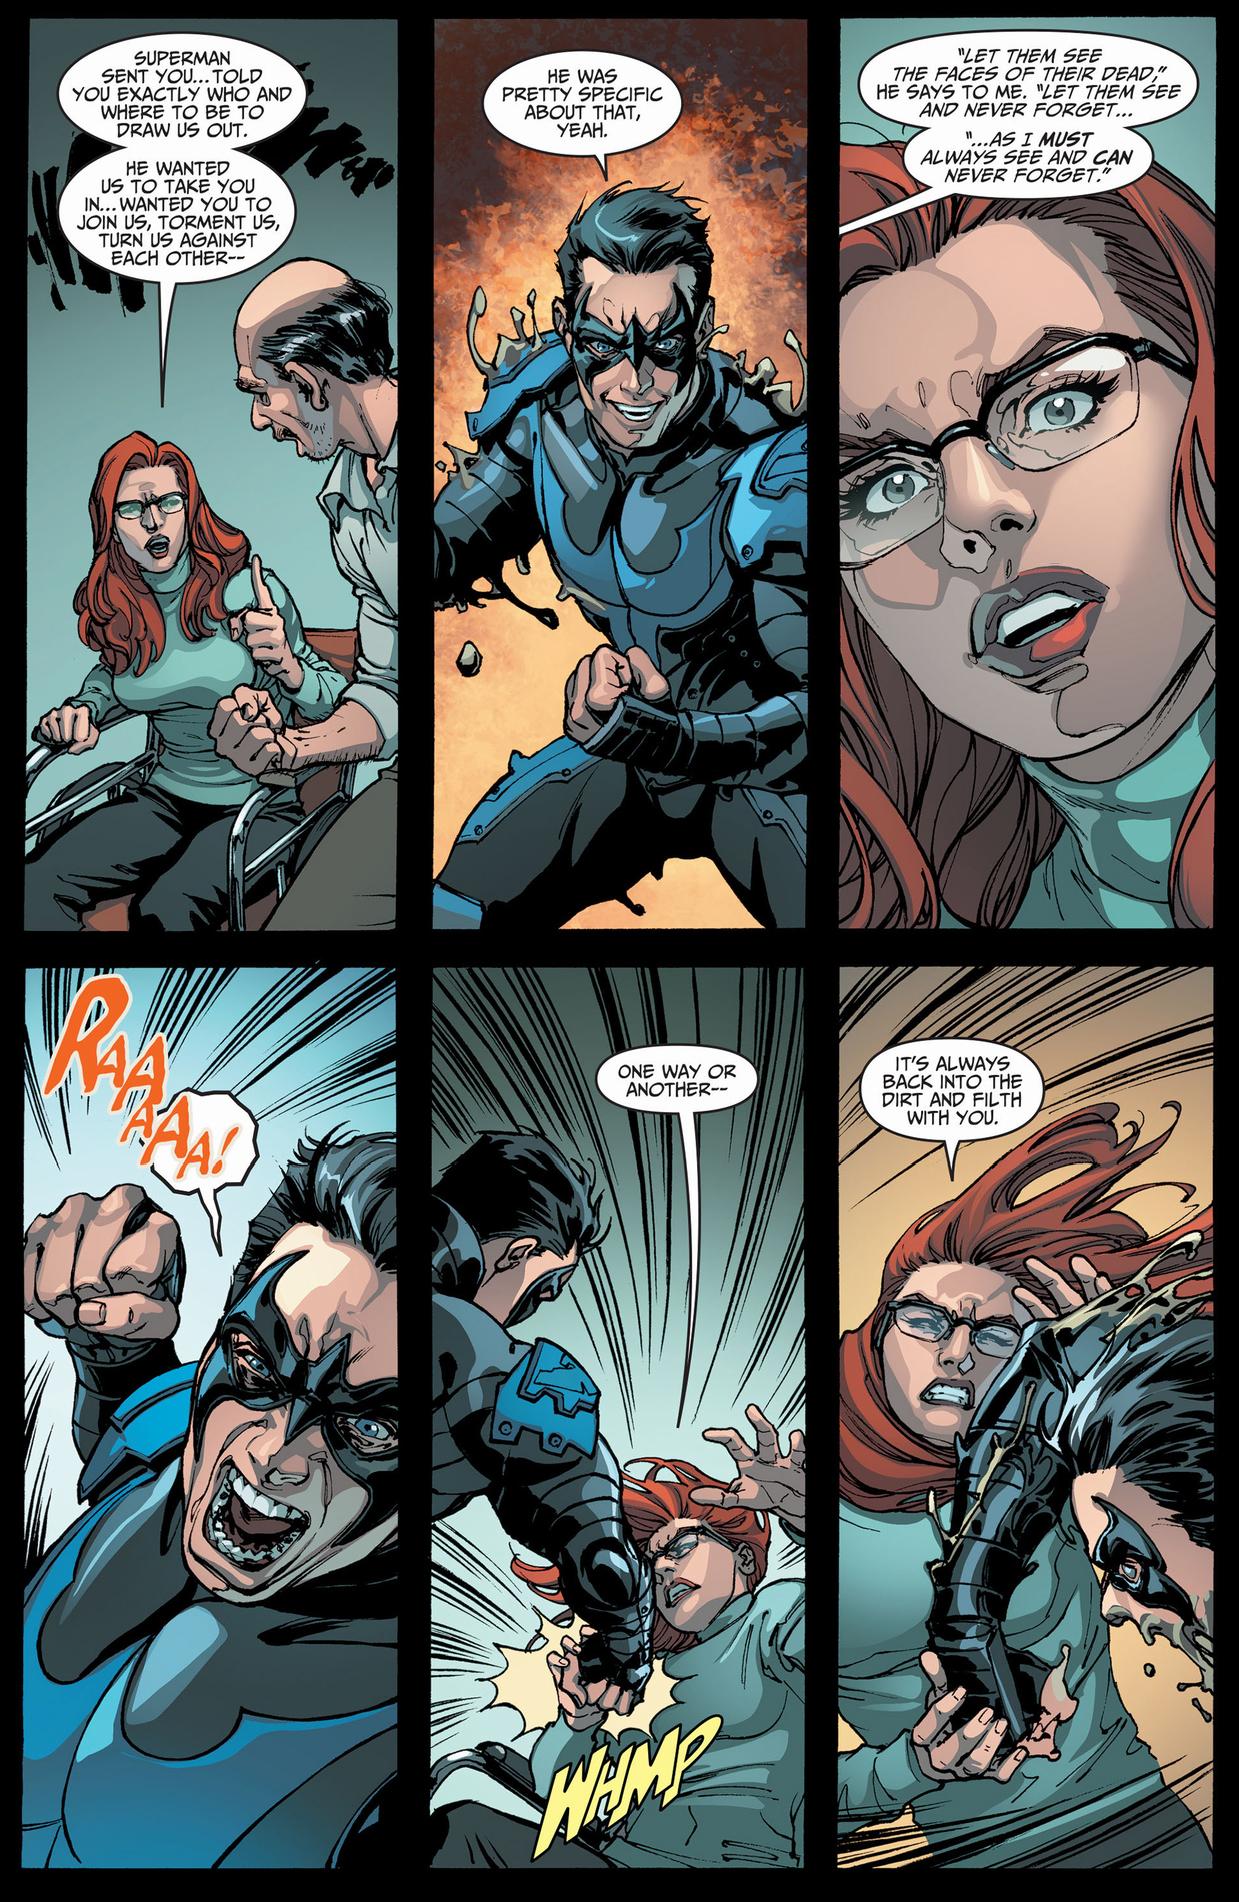 Nightwing | Comicnewbies | Page 2 Nightwing Injustice Comic